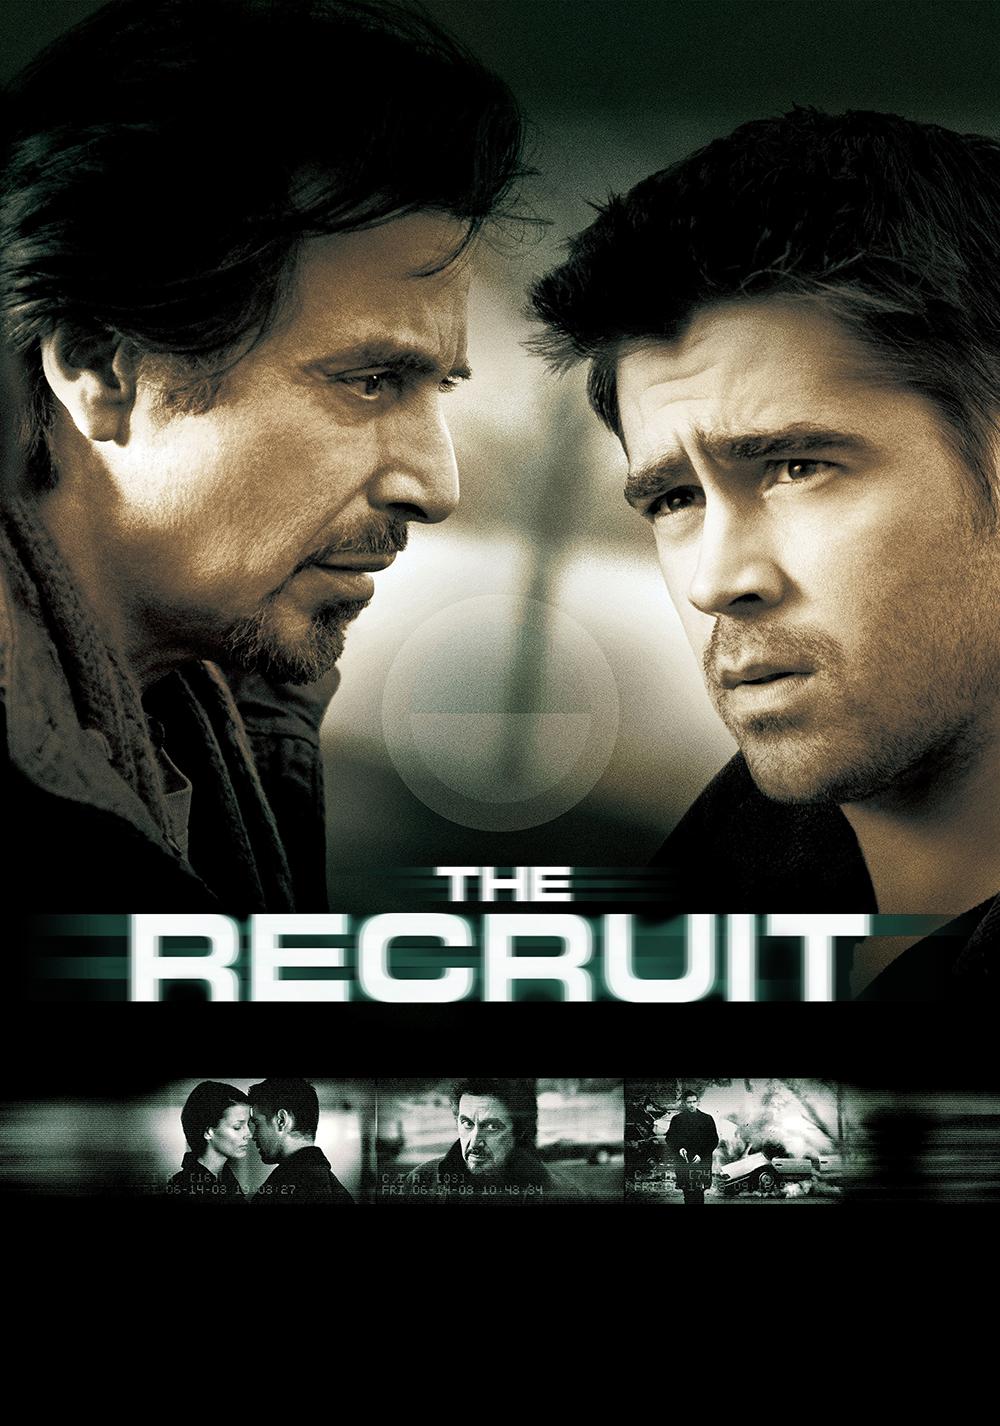 the recruit movie online free agra ka daabra movie wiki